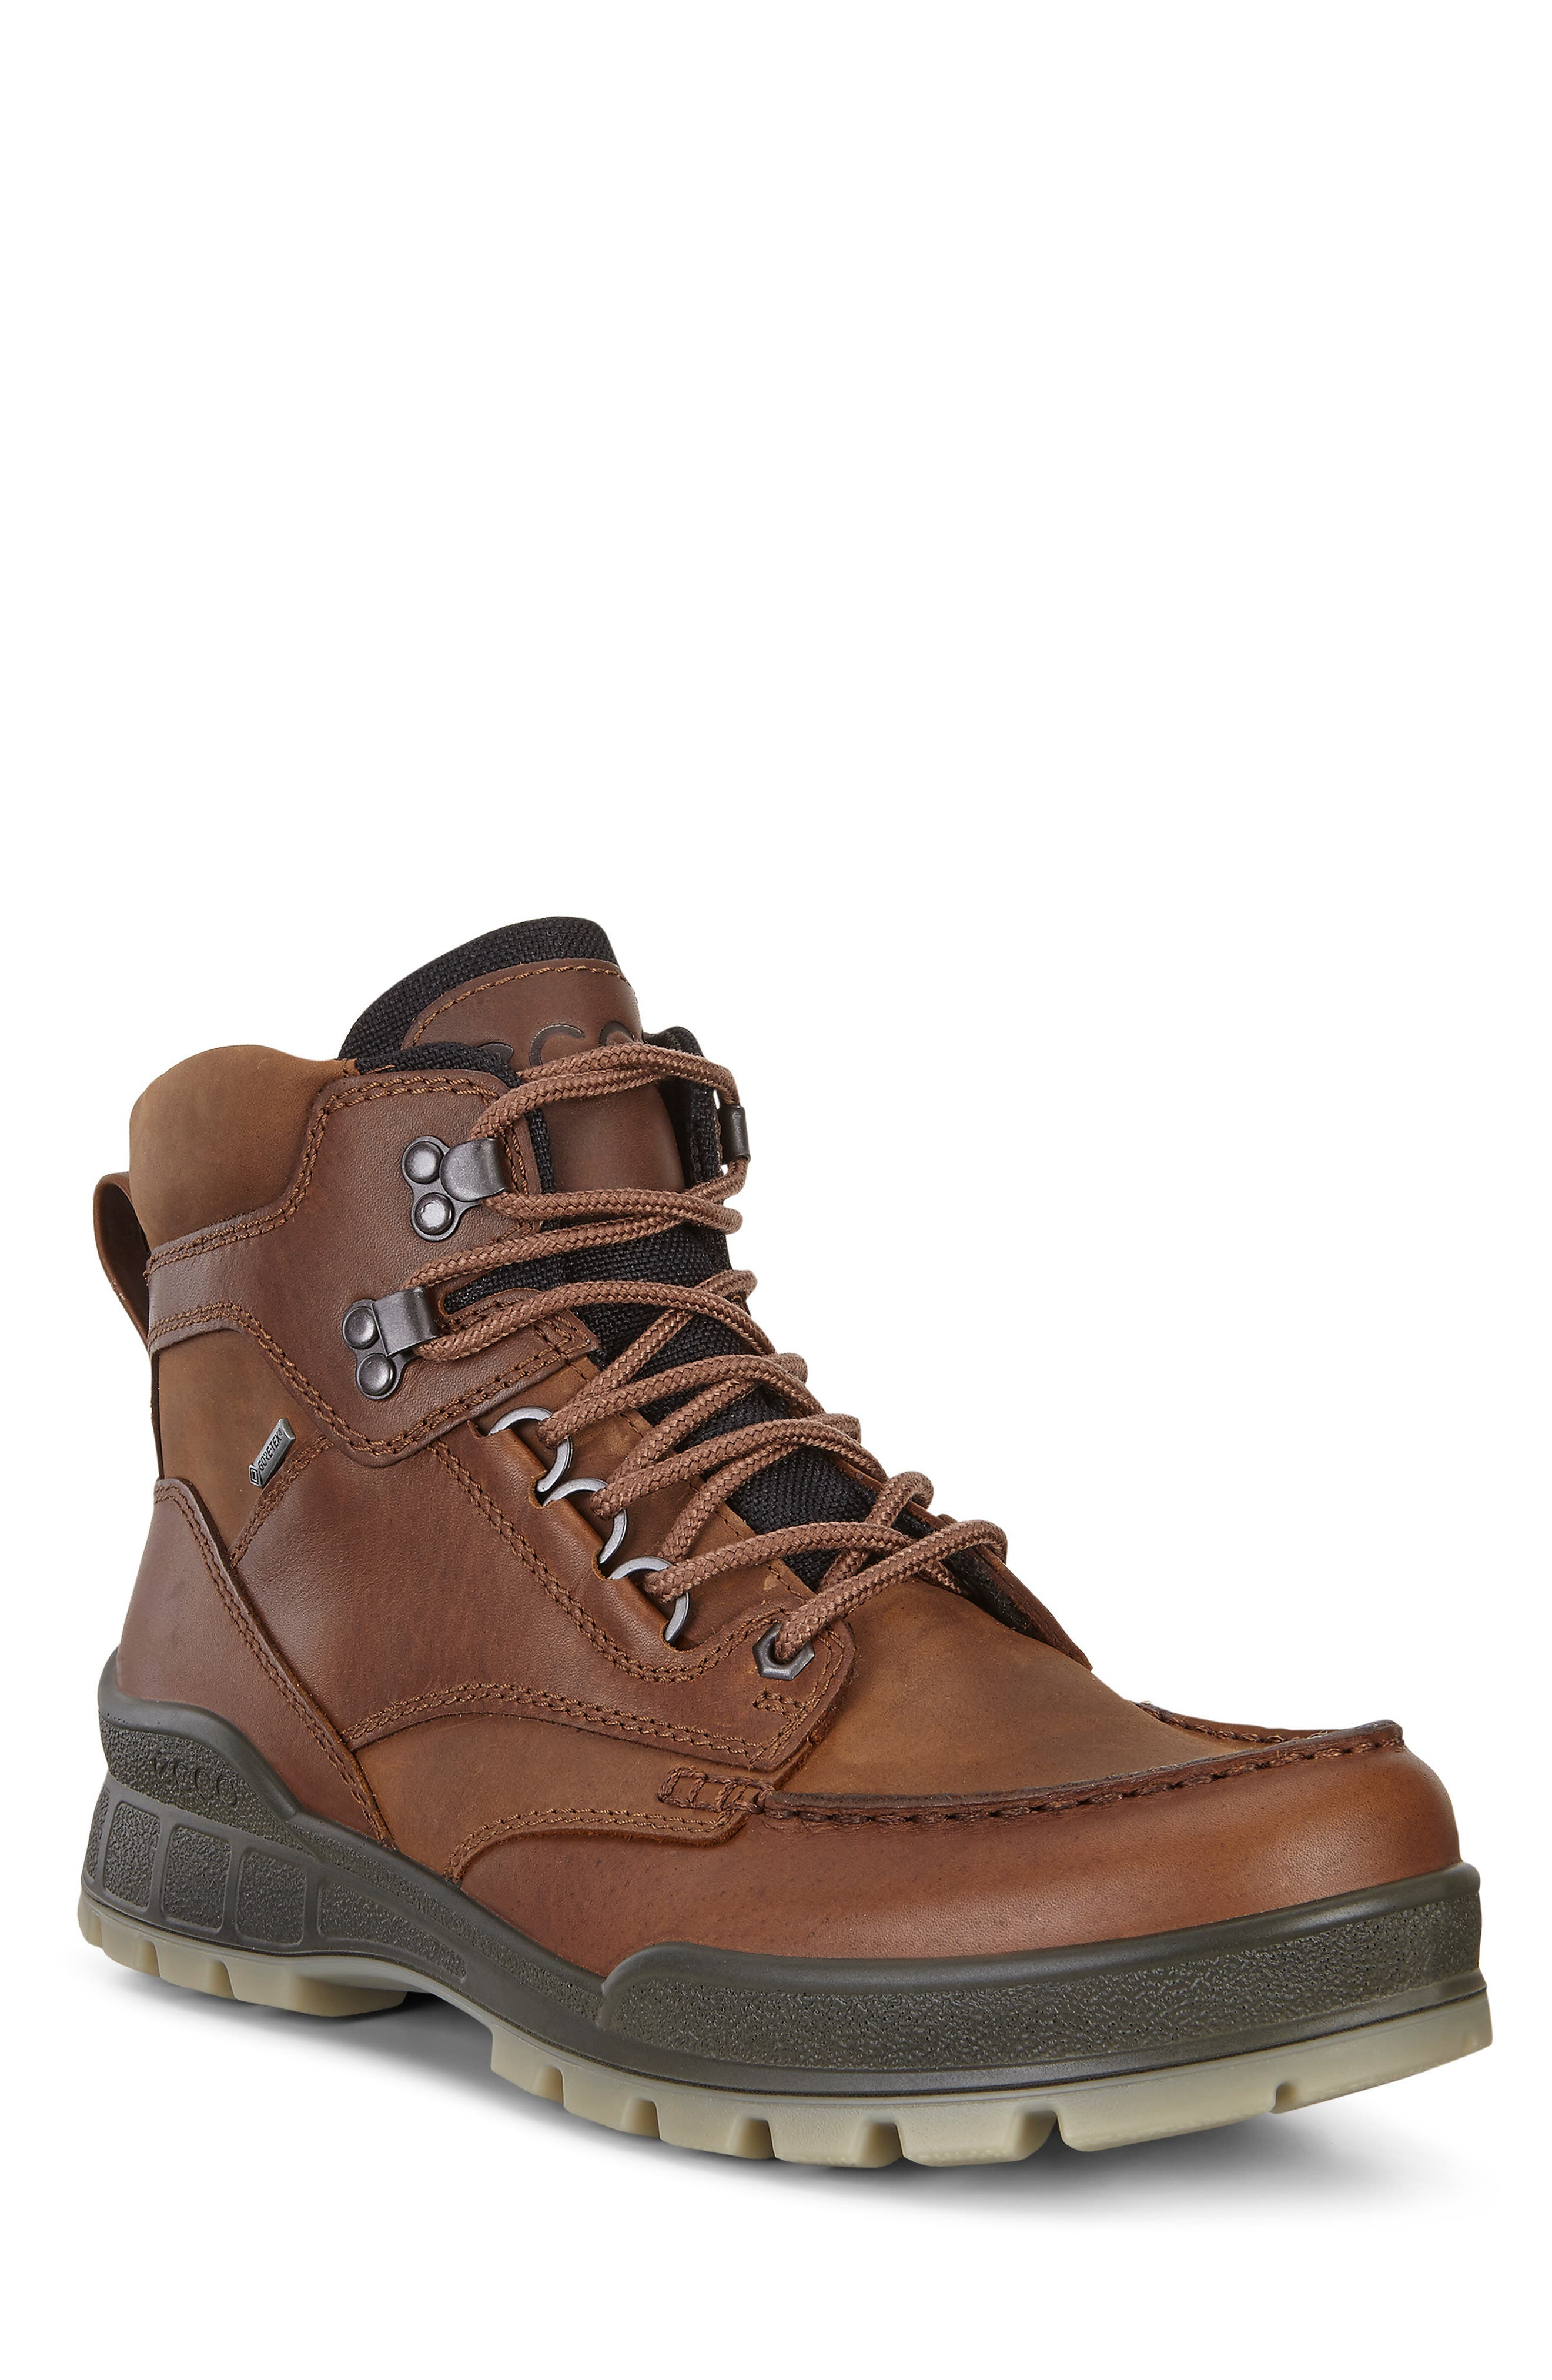 Men's Ecco Track 25 Boot